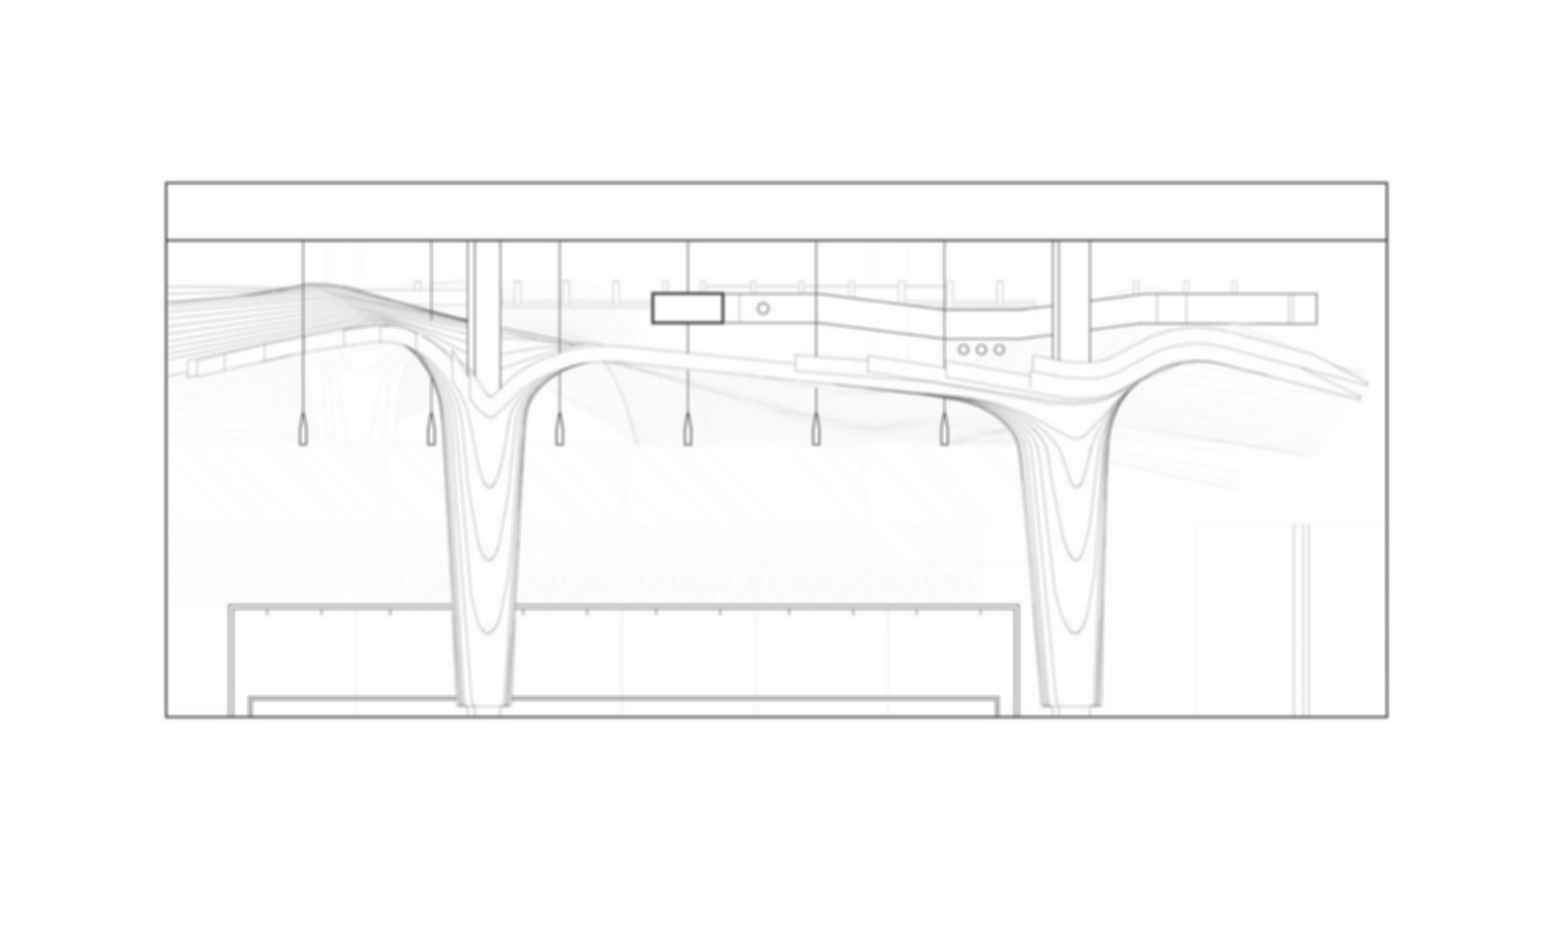 BanQ Restaurant - Concept Design